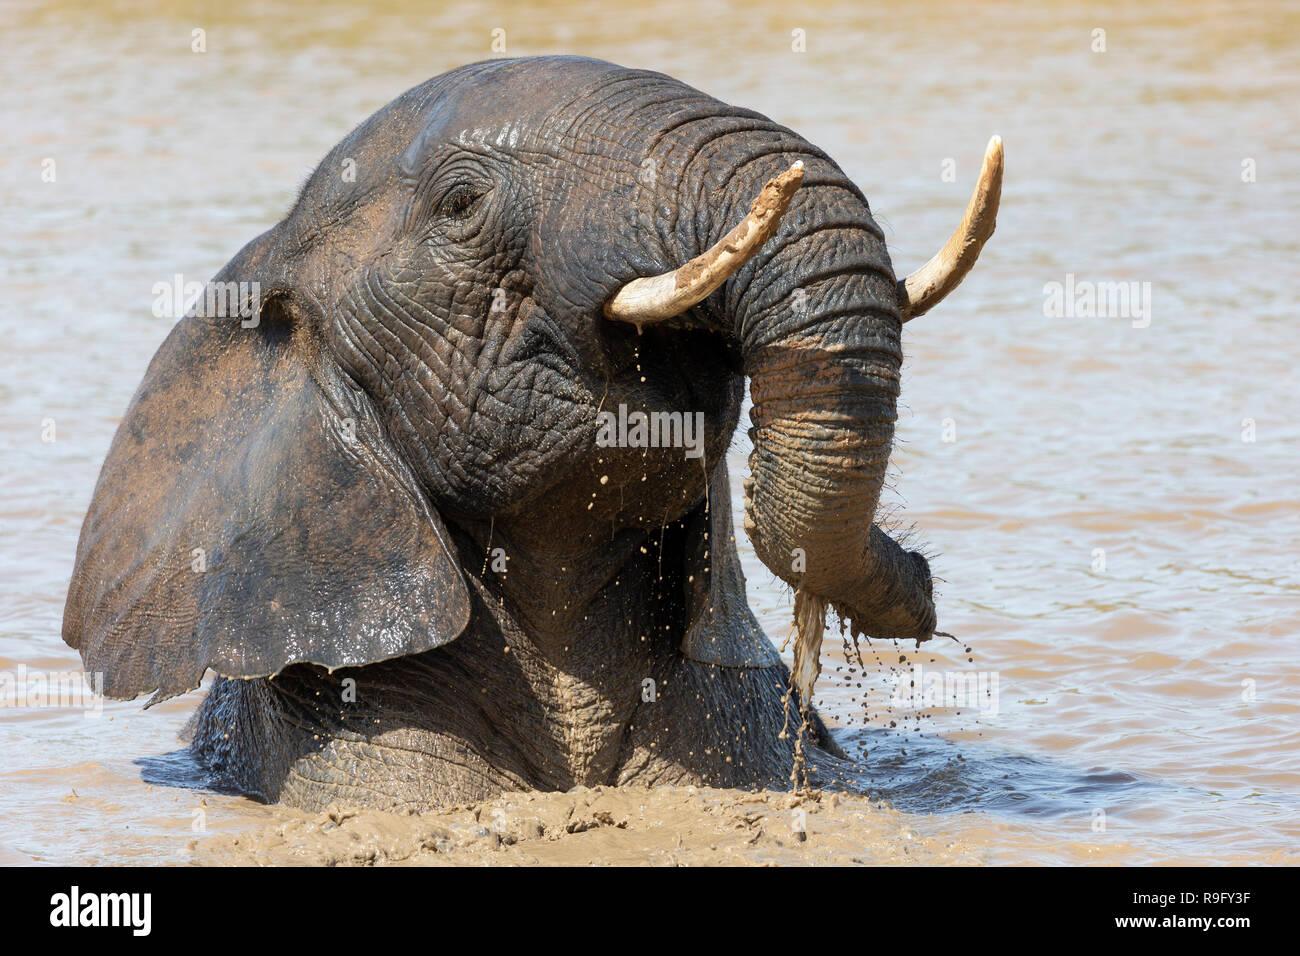 Elefante africano (Loxodonta africana) balneazione, Addo Elephant national park, Capo orientale, Sud Africa, Immagini Stock